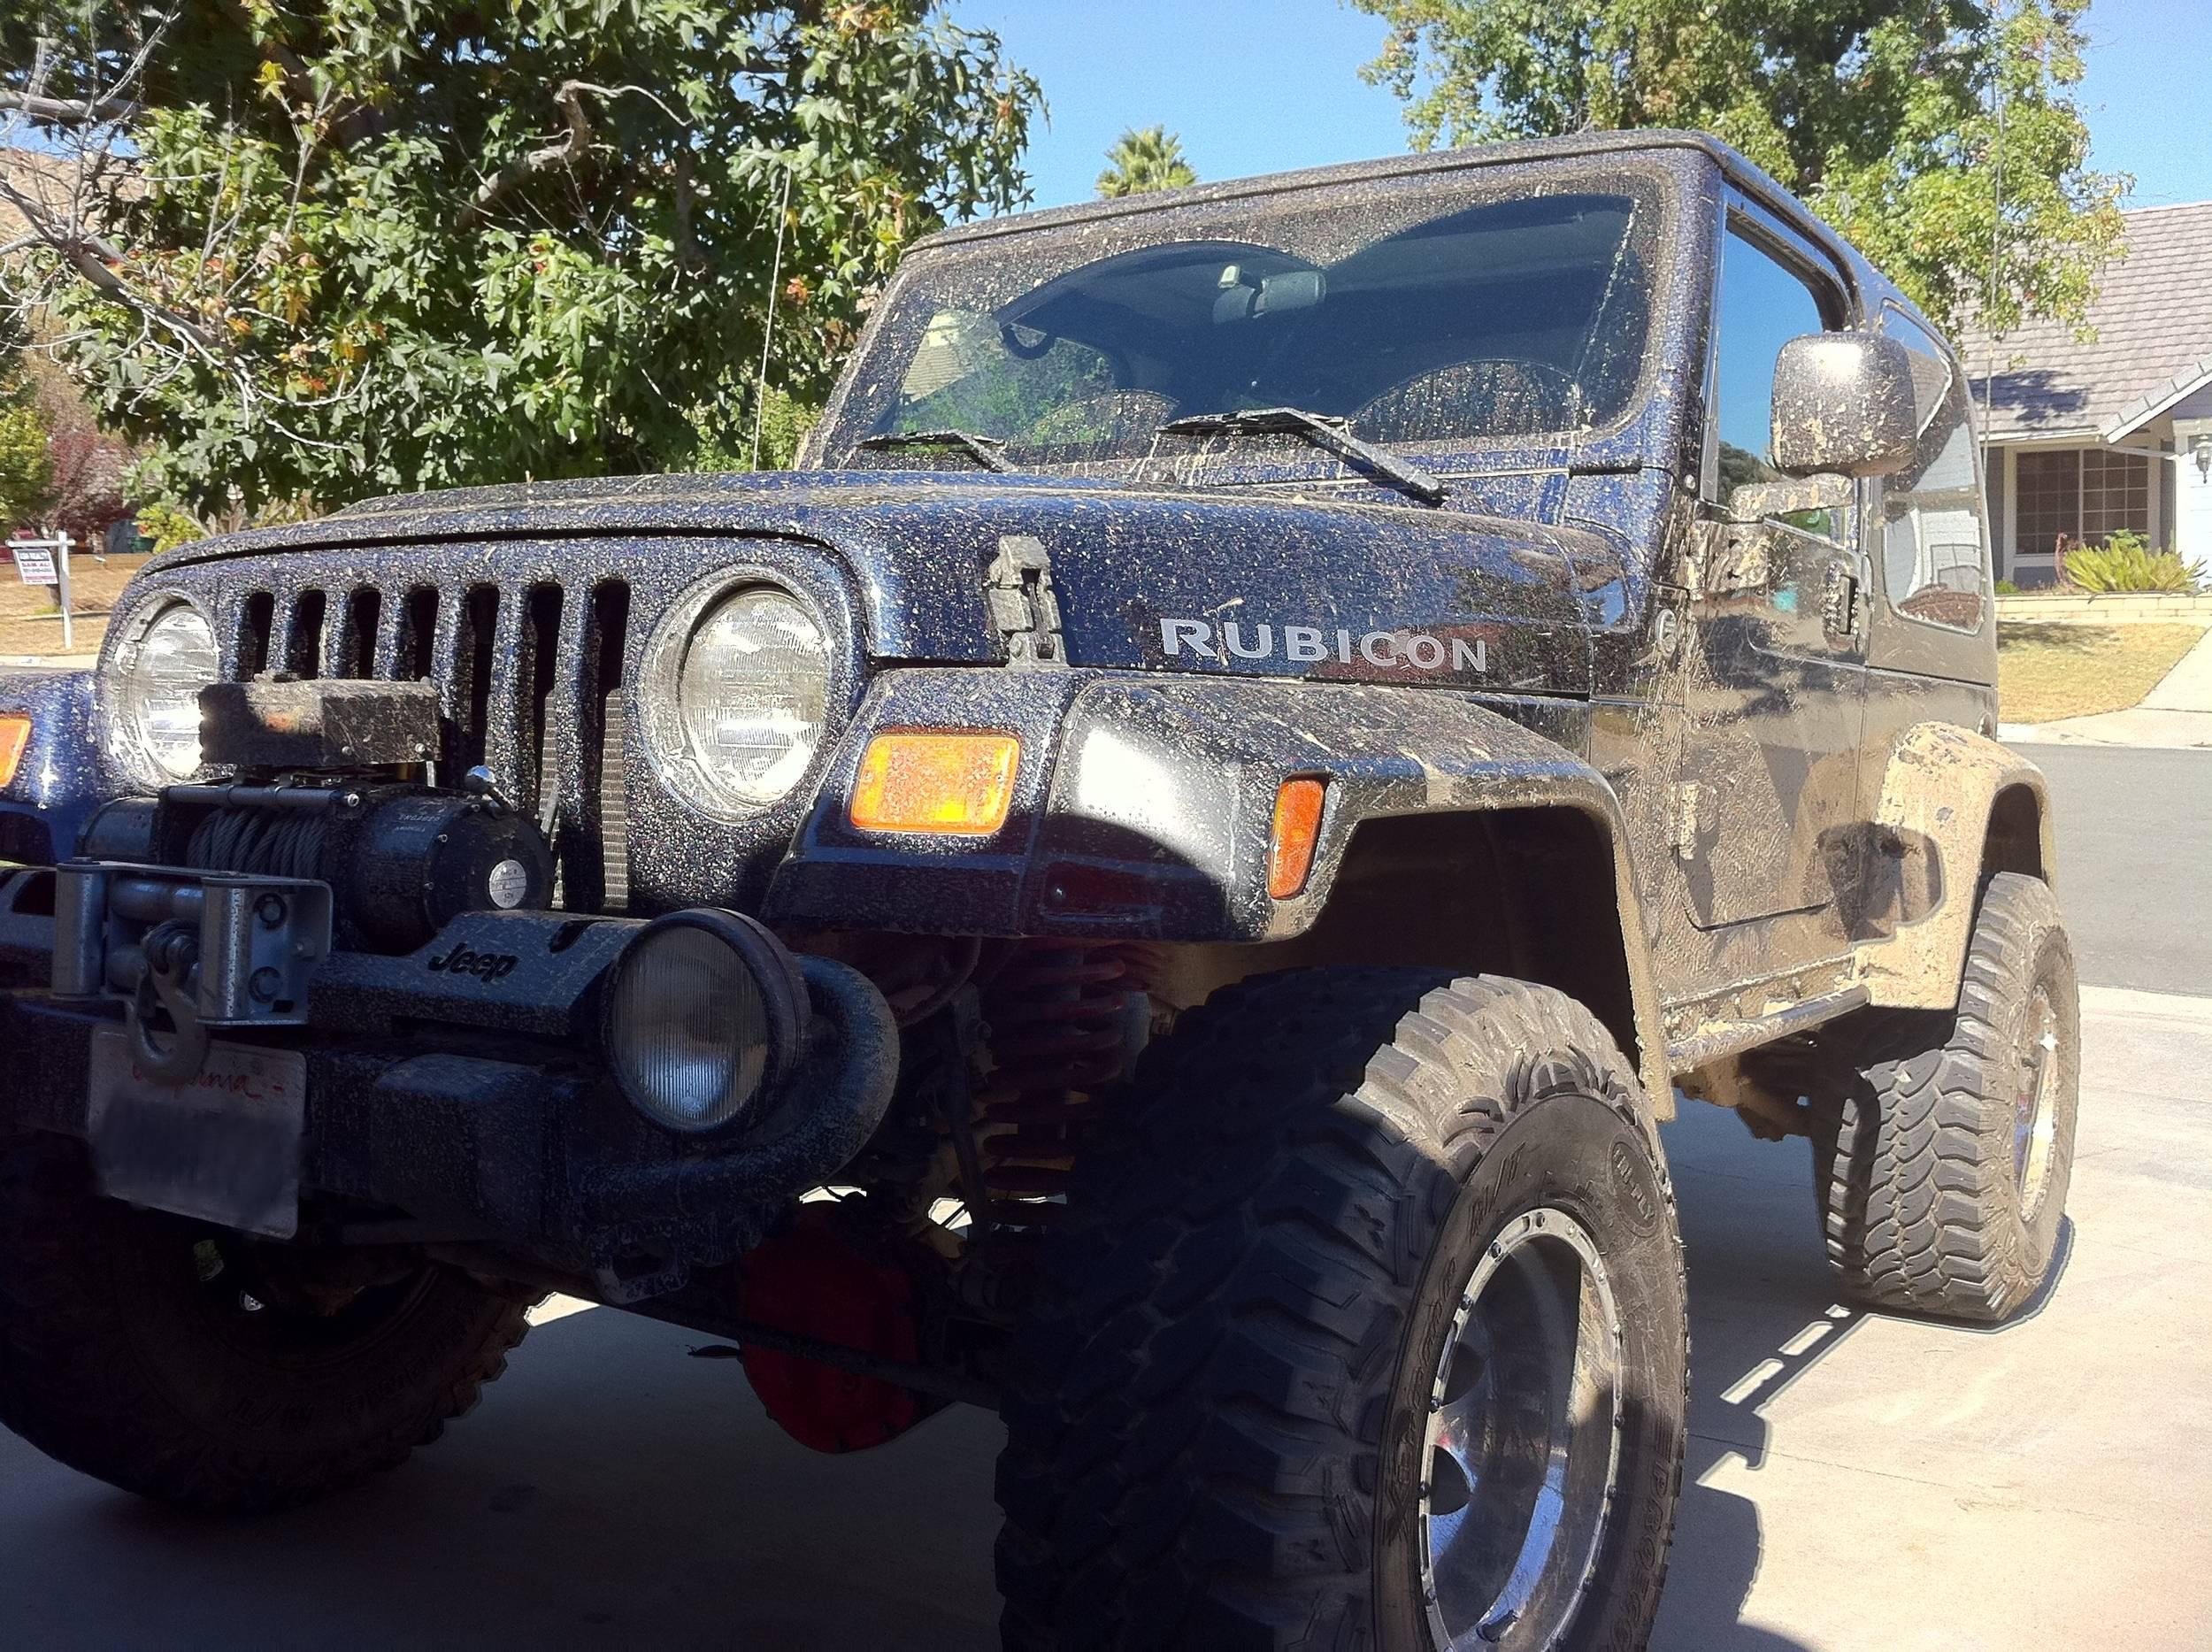 Muddy_jeep10.JPG